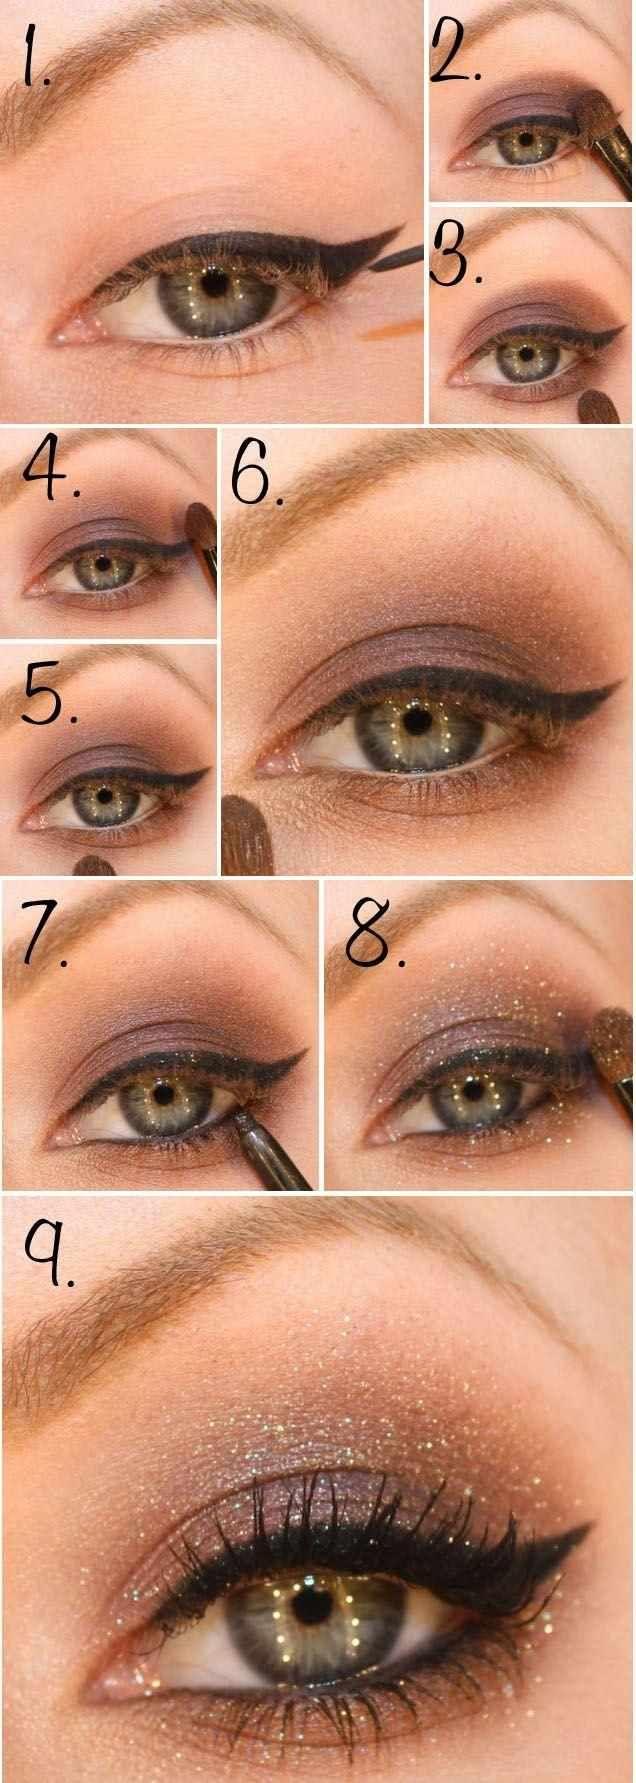 maquillage des yeux original - eye-liner et particules brillantes